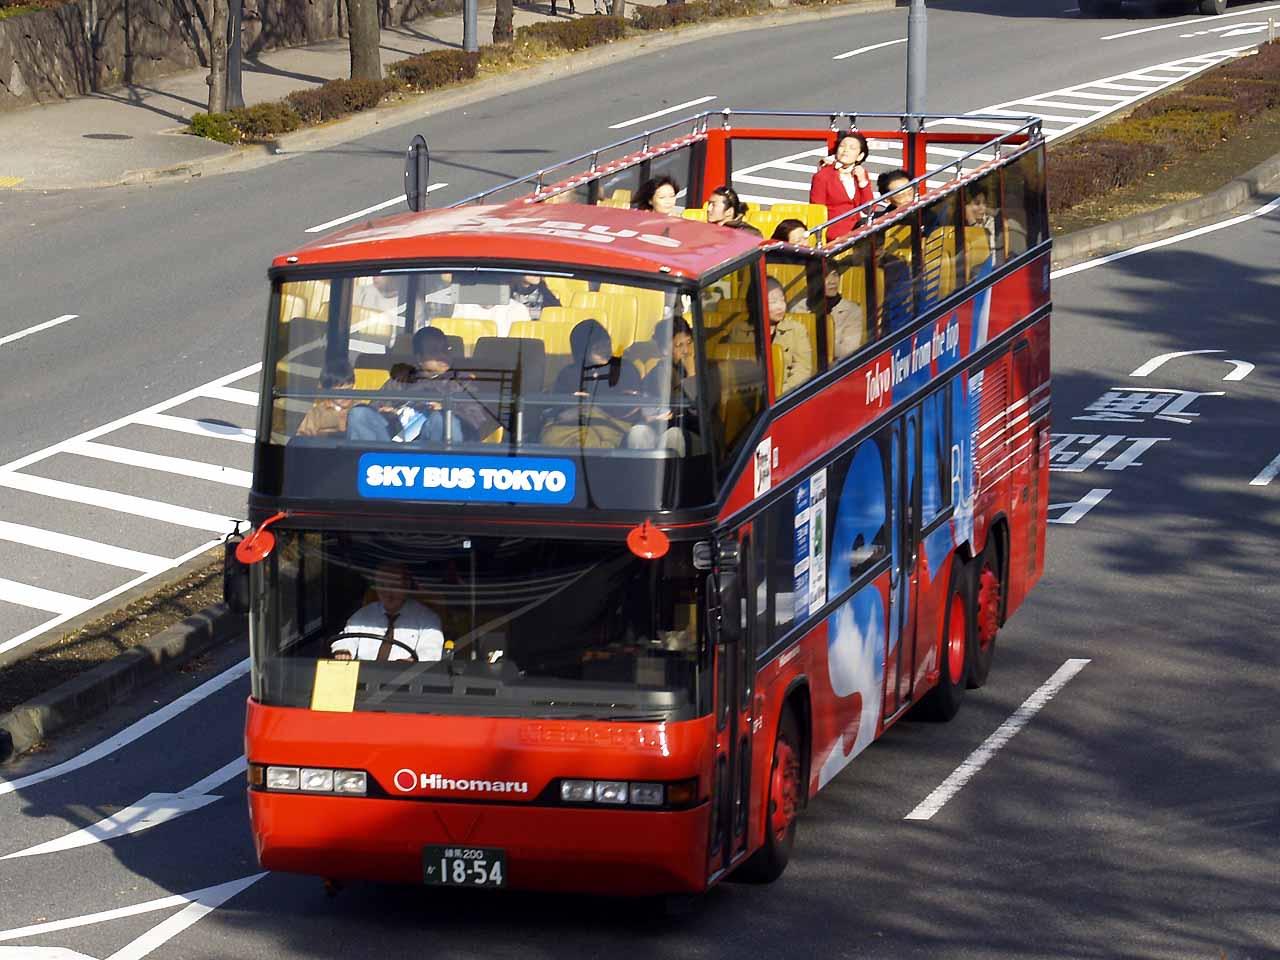 SKY BUS TOKYO:適合全家大小一起搭乘的一款巴士|來源:commons.wikimedia.org